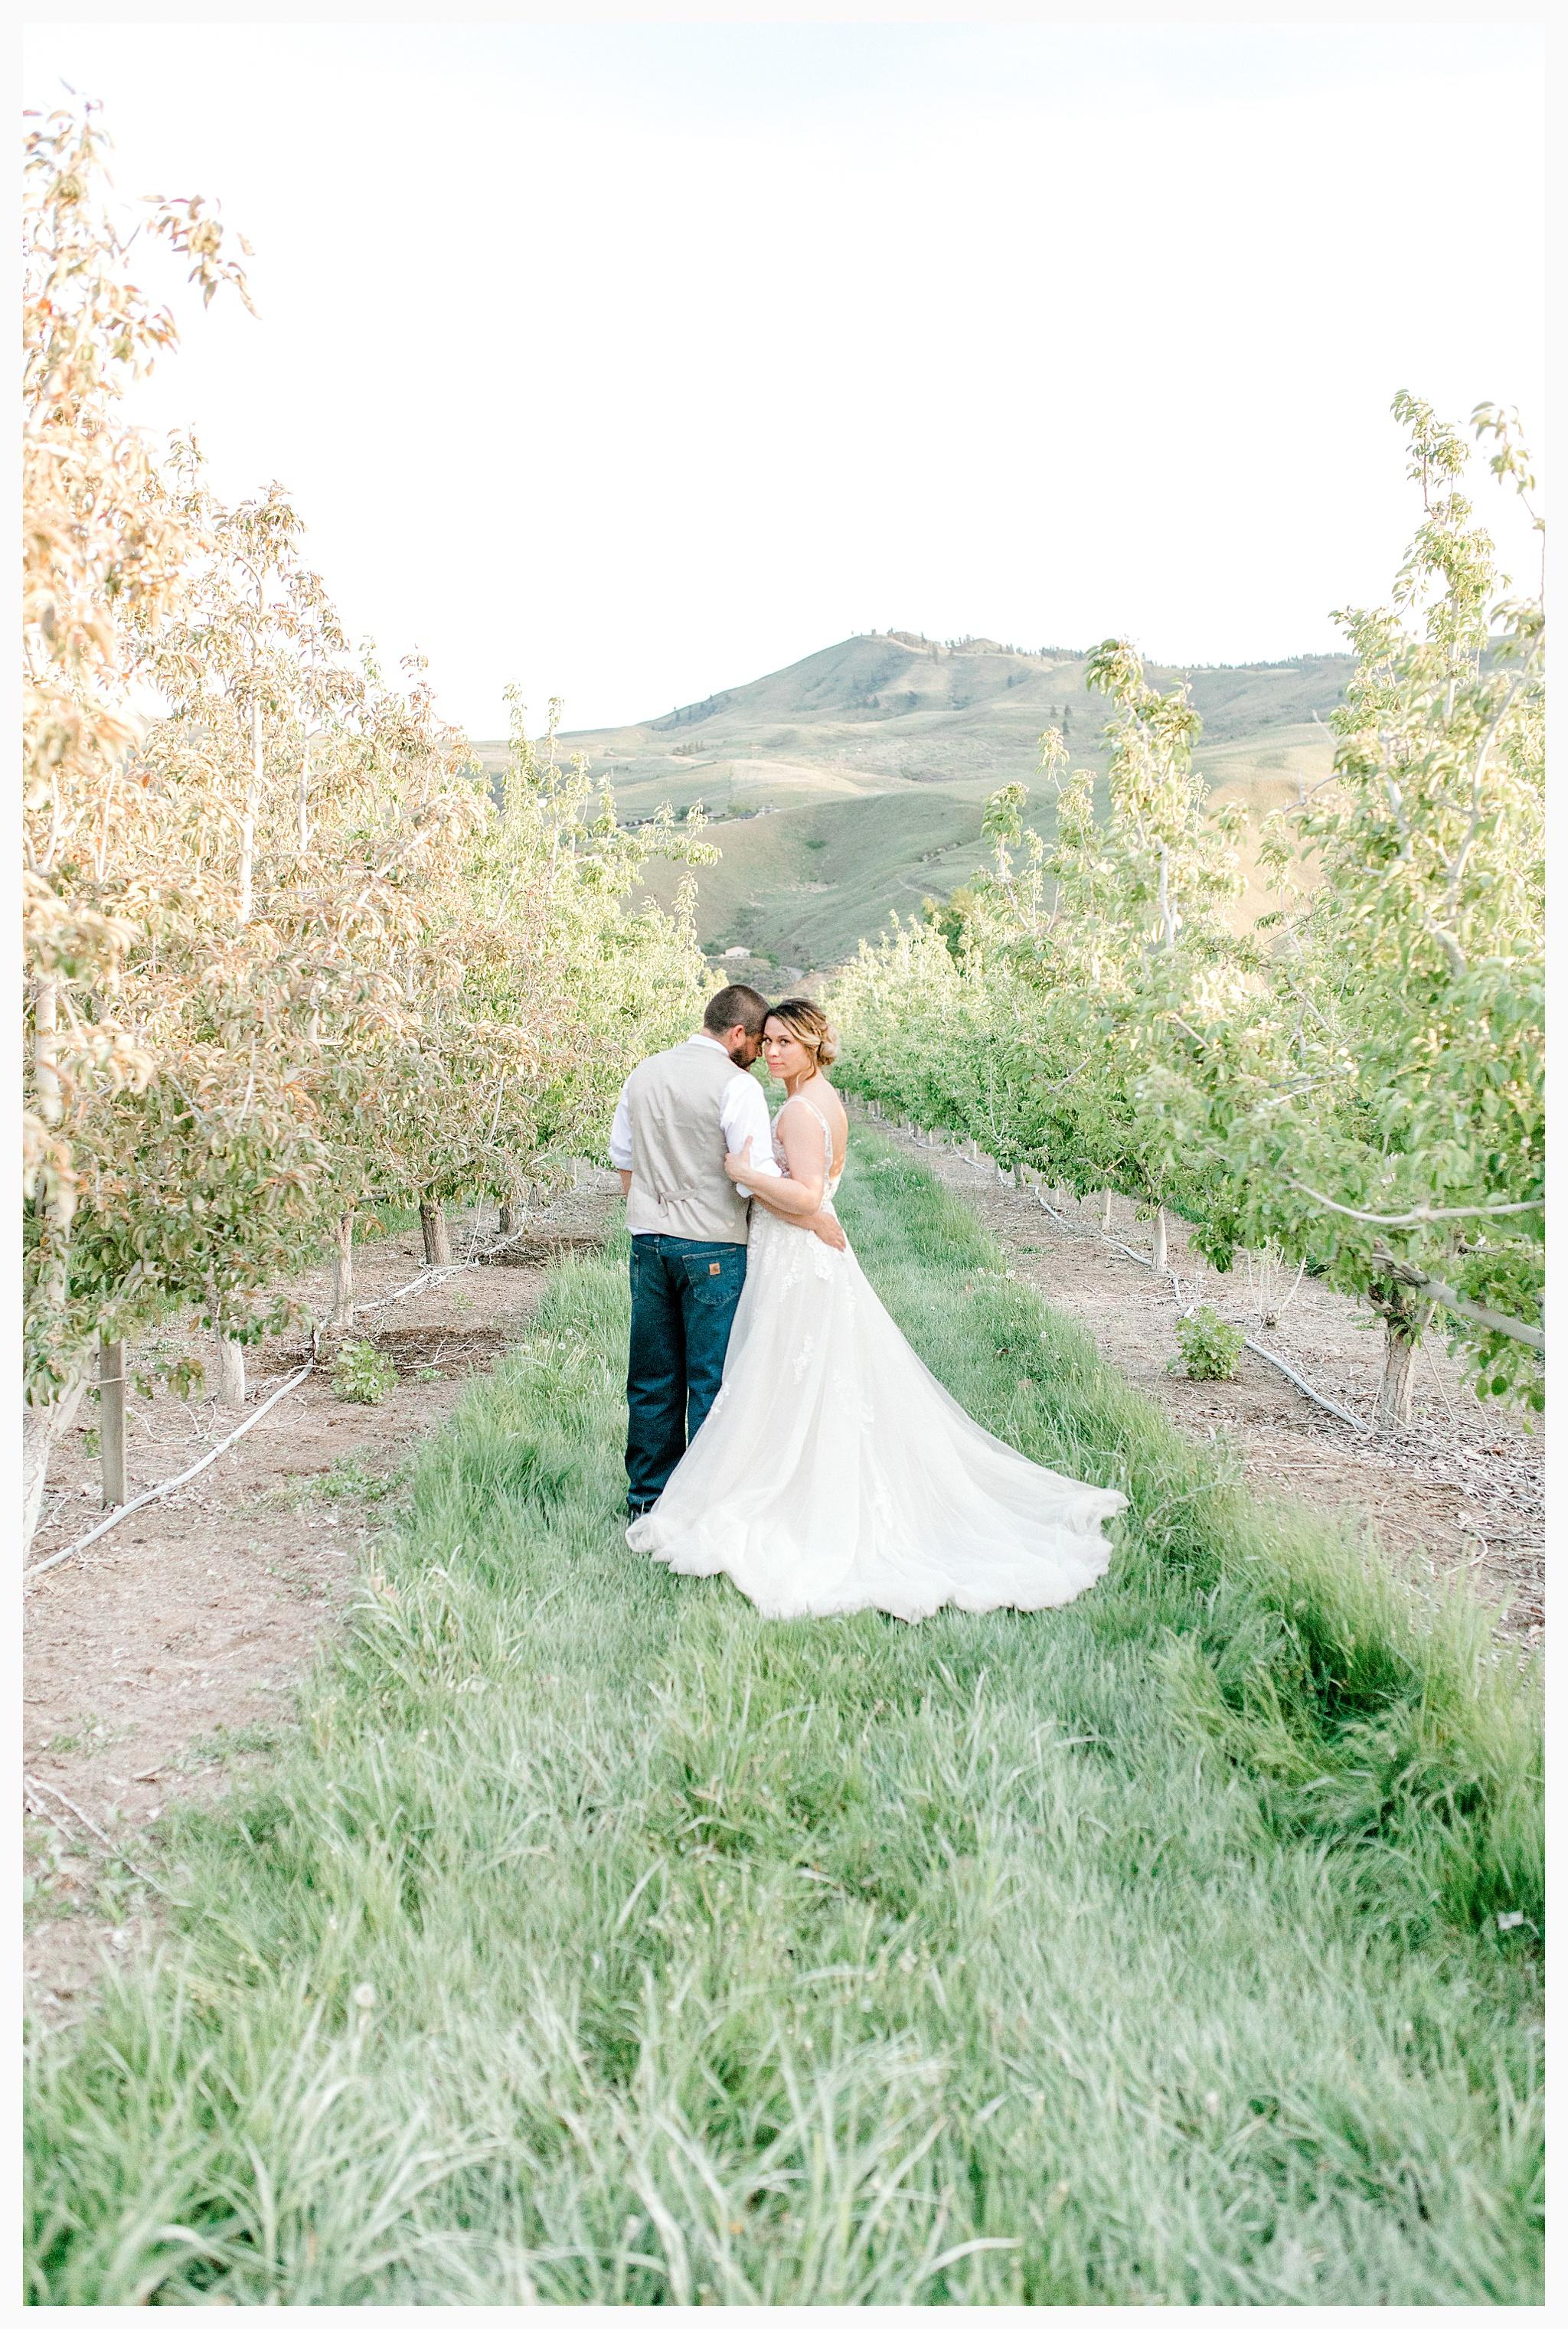 Rustic barn wedding in Wenatchee Washington at Sunshine Ranch on Easy Street, Emma Rose Company Seattle PNW Light and Airy Wedding Photographer_0136.jpg